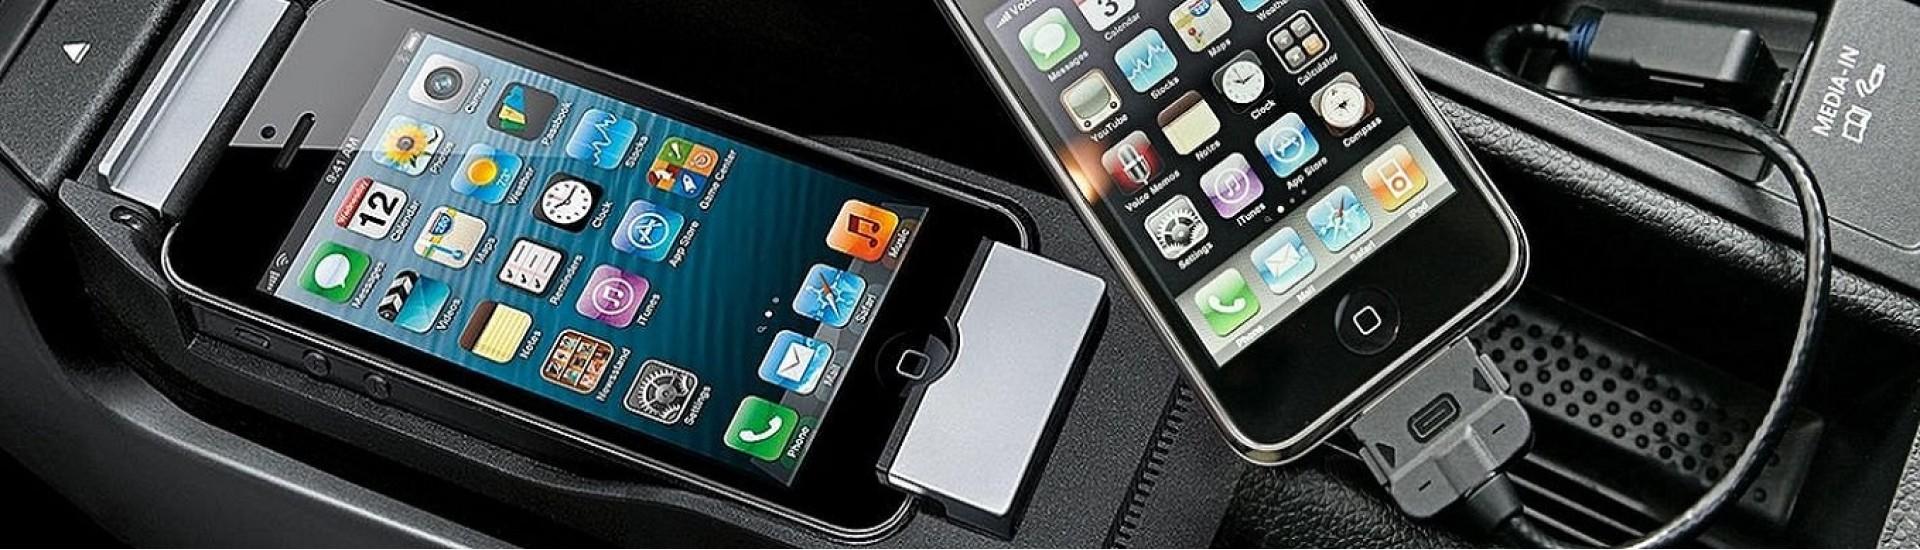 اندروید و  آیفون ، iphone & android integration